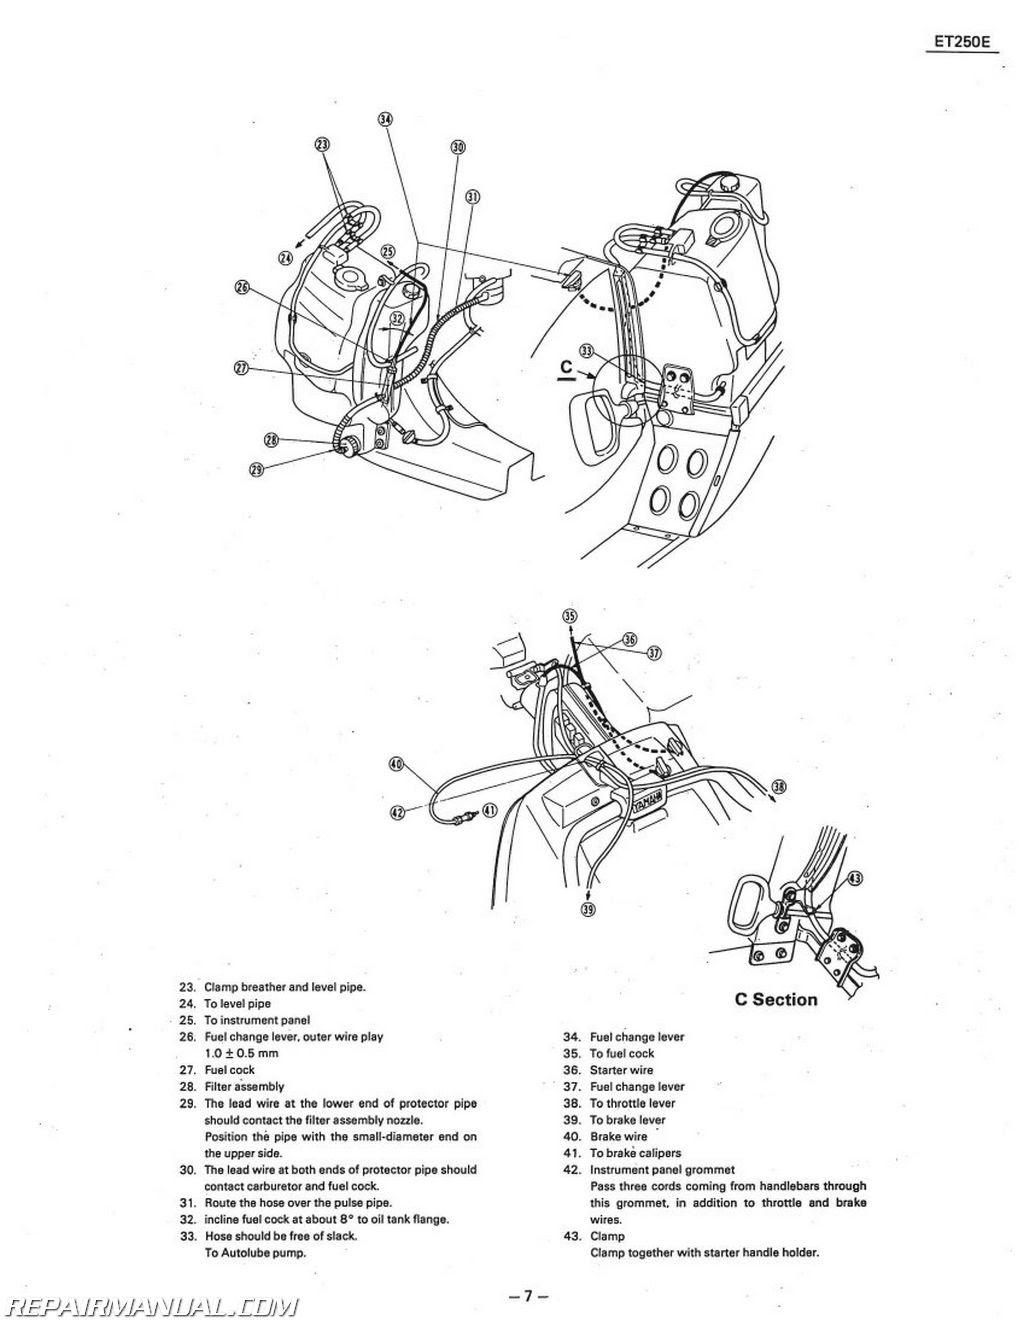 Diagram Yamaha Enticer Wiring Diagram Full Version Hd Quality Wiring Diagram Fisherswiring2j Atuttasosta It